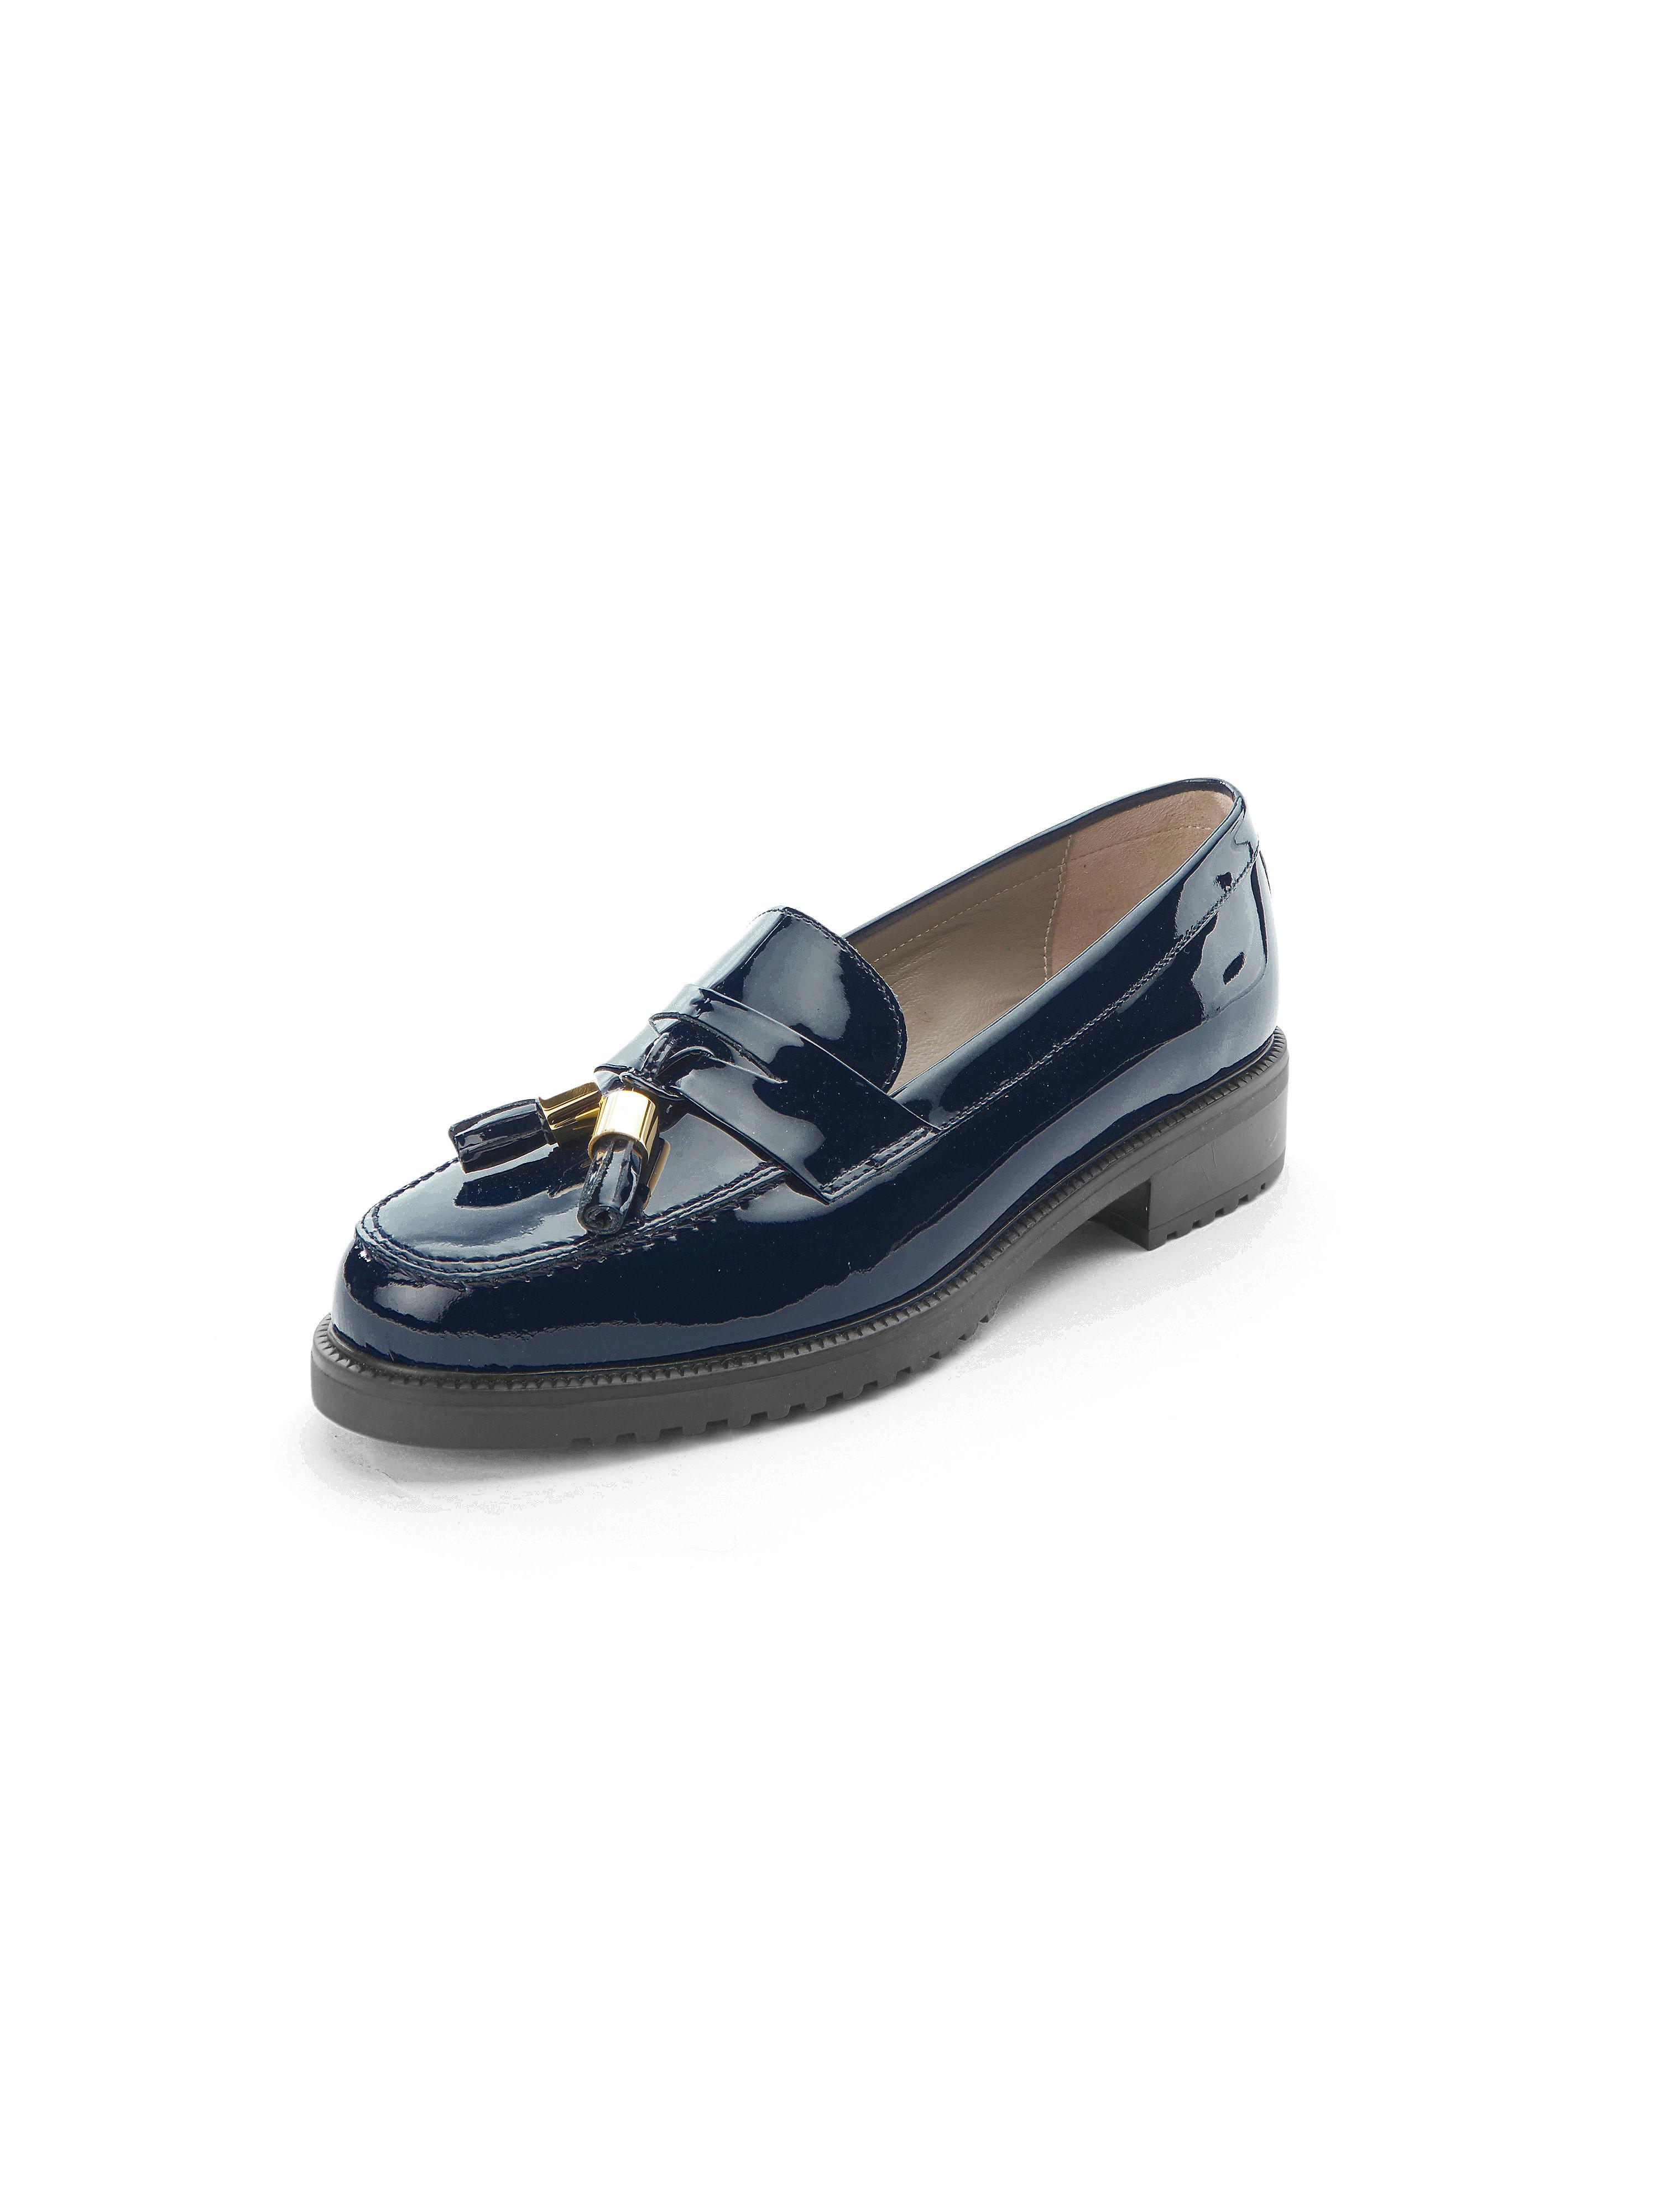 Les mocassins cuir verni Ledoni bleu taille 36